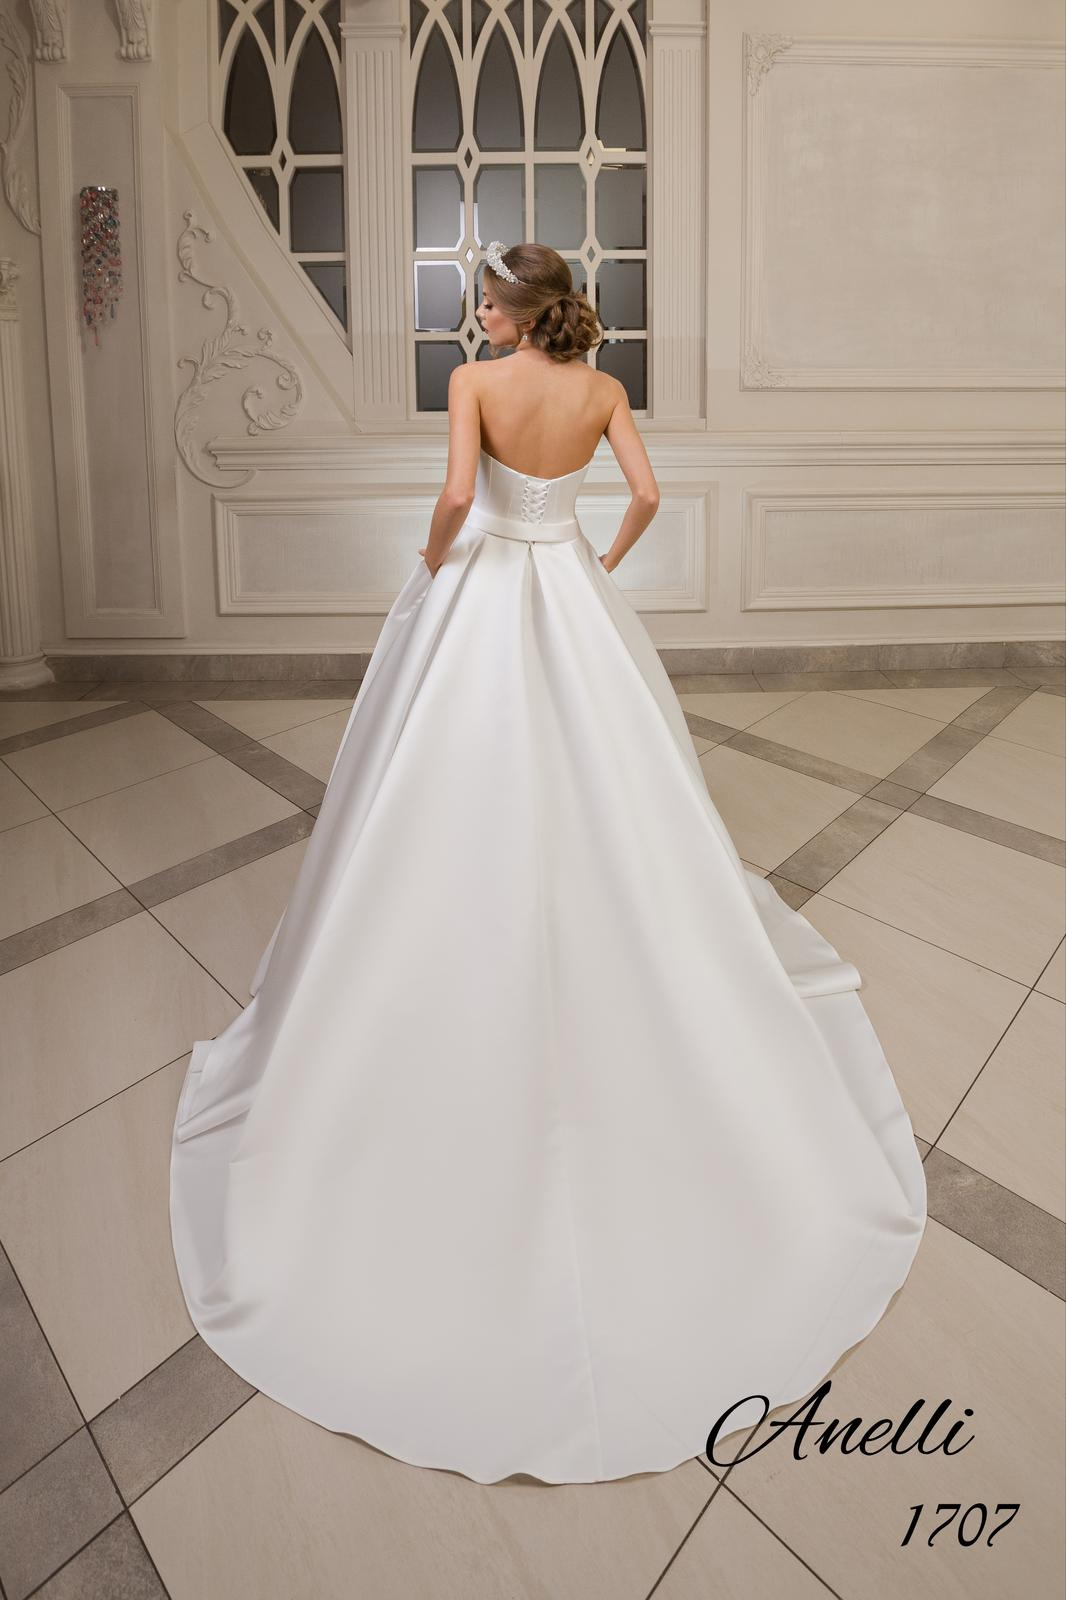 Svadobné šaty - Debut 1707 - Obrázok č. 4